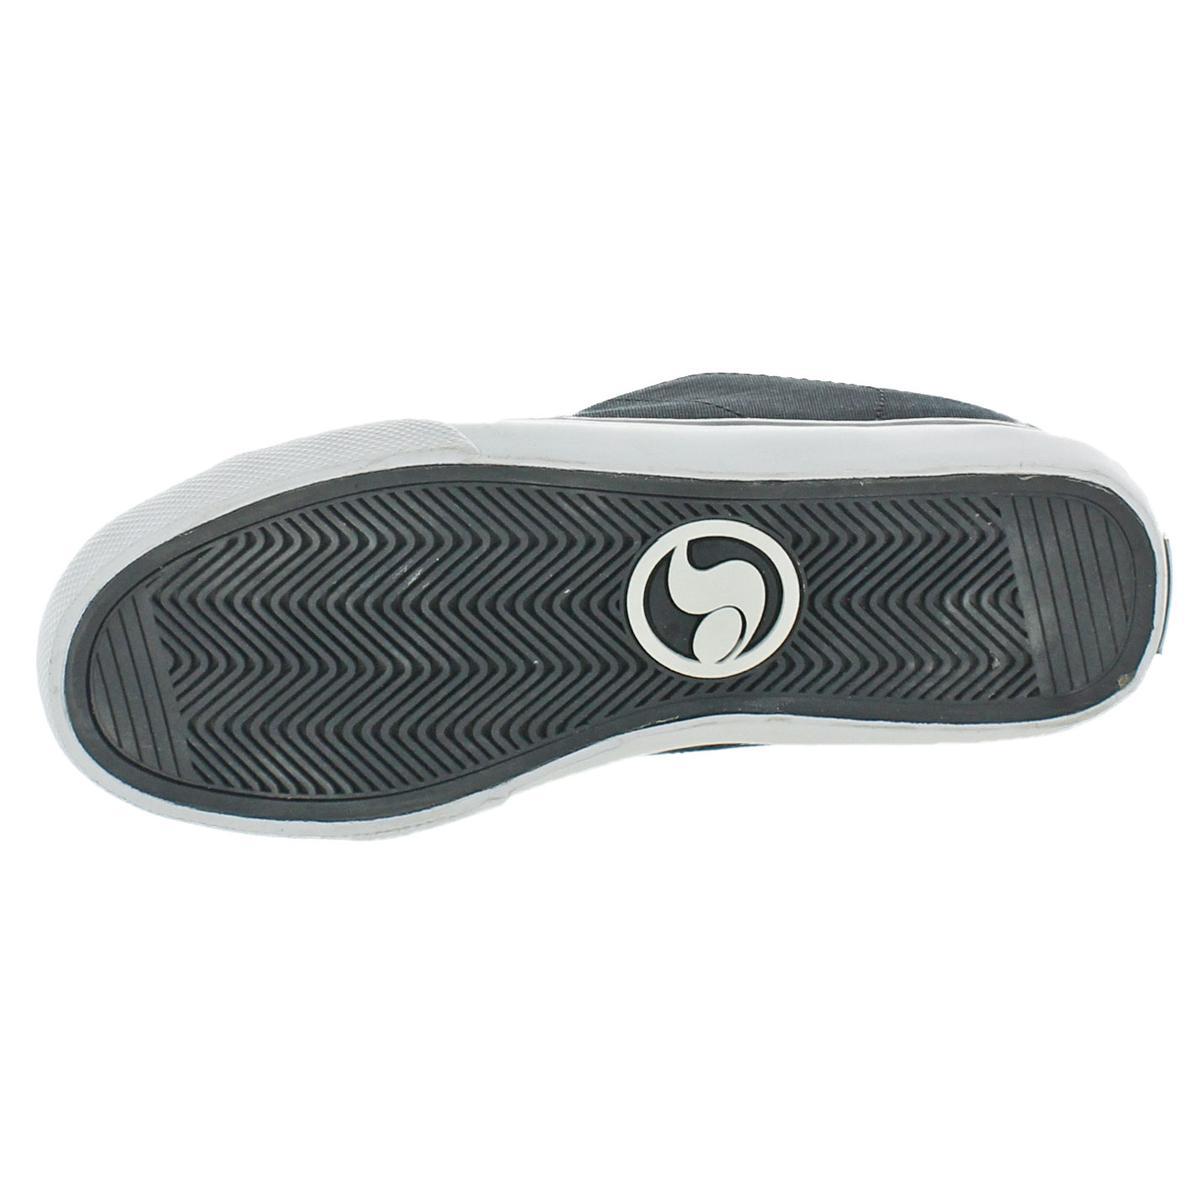 b395b62ce5de6 DVS Mens Gavin CT Low-Top Fashion Performance Skate Shoes Sneakers ...